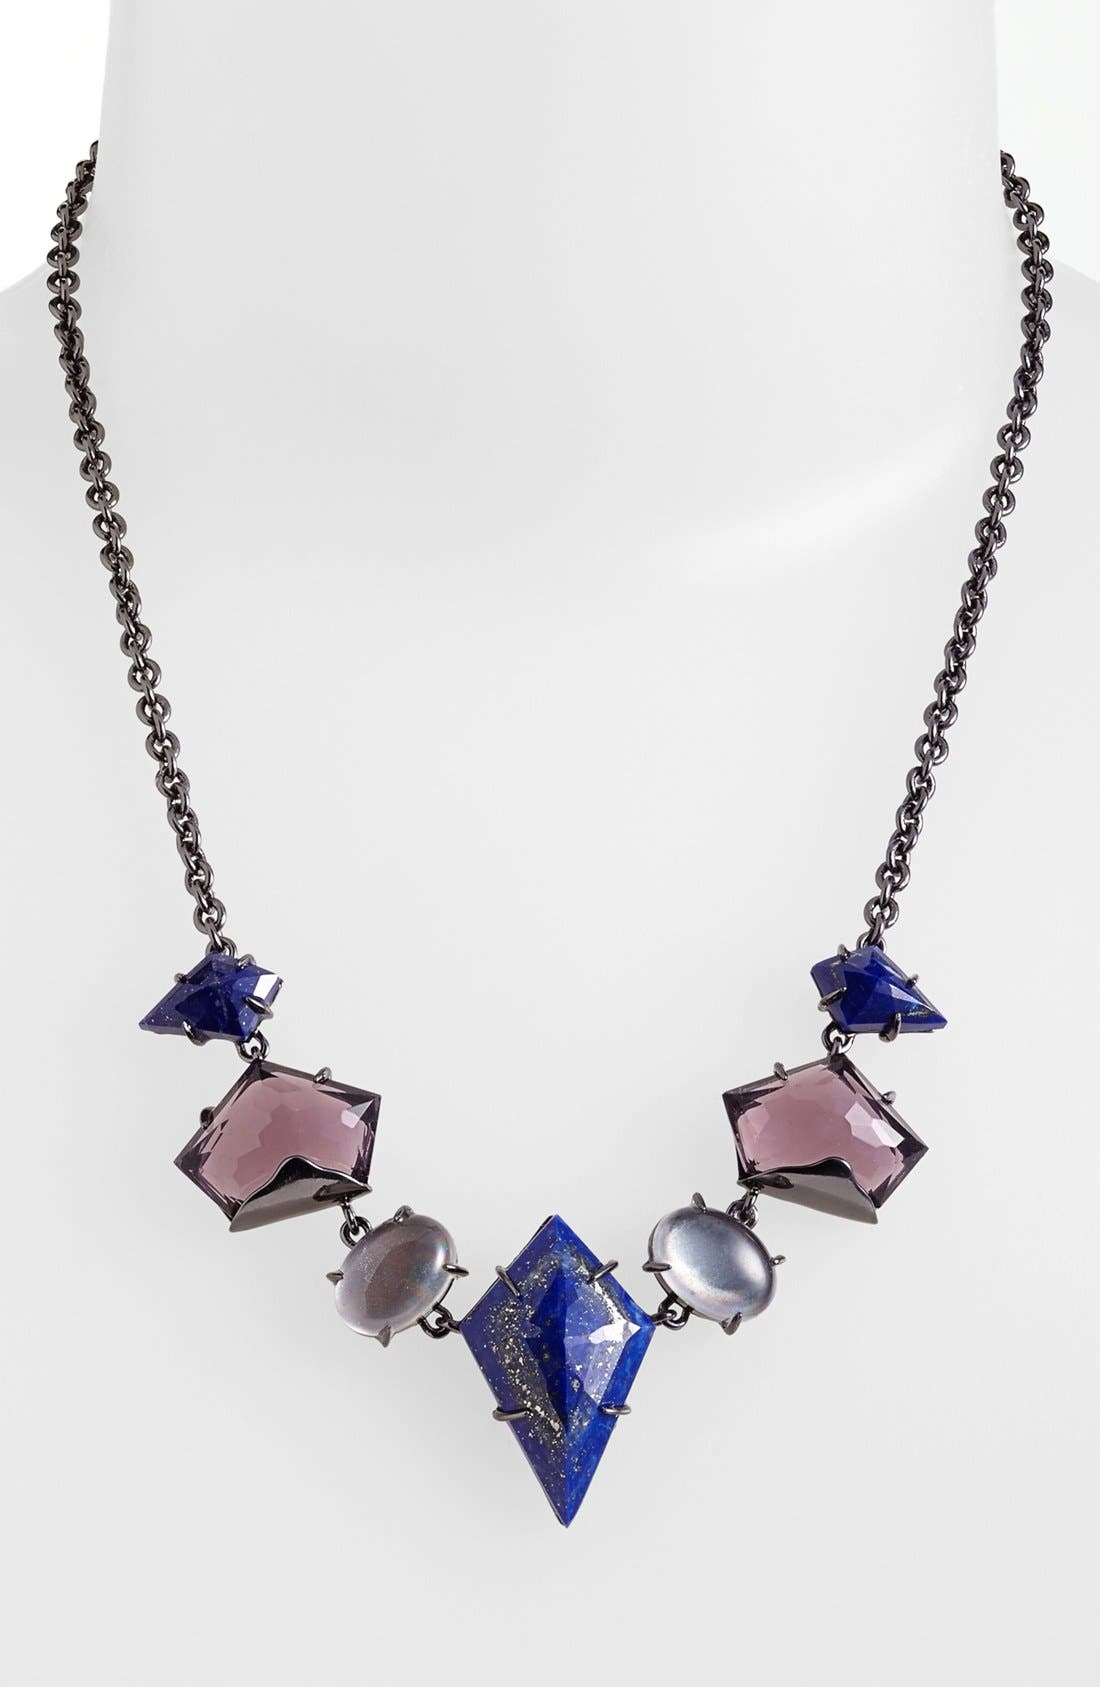 Main Image - Alexis Bittar 'Miss Havisham' Frontal Necklace